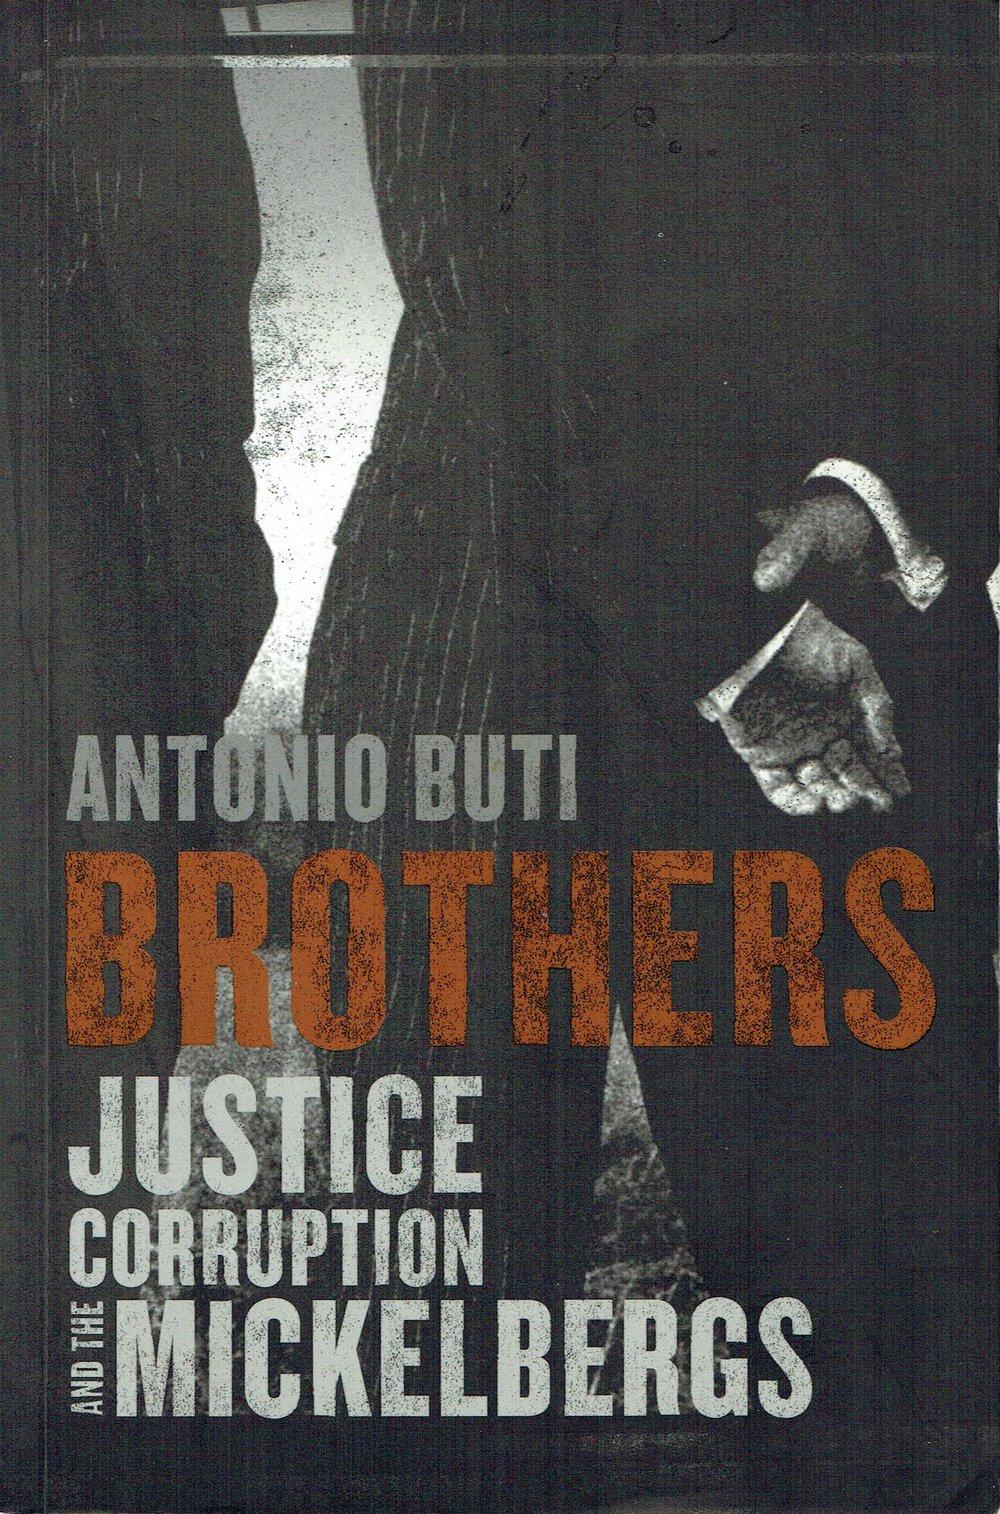 BrothersJusticeCorruptionAndTheMickelbergs.jpg